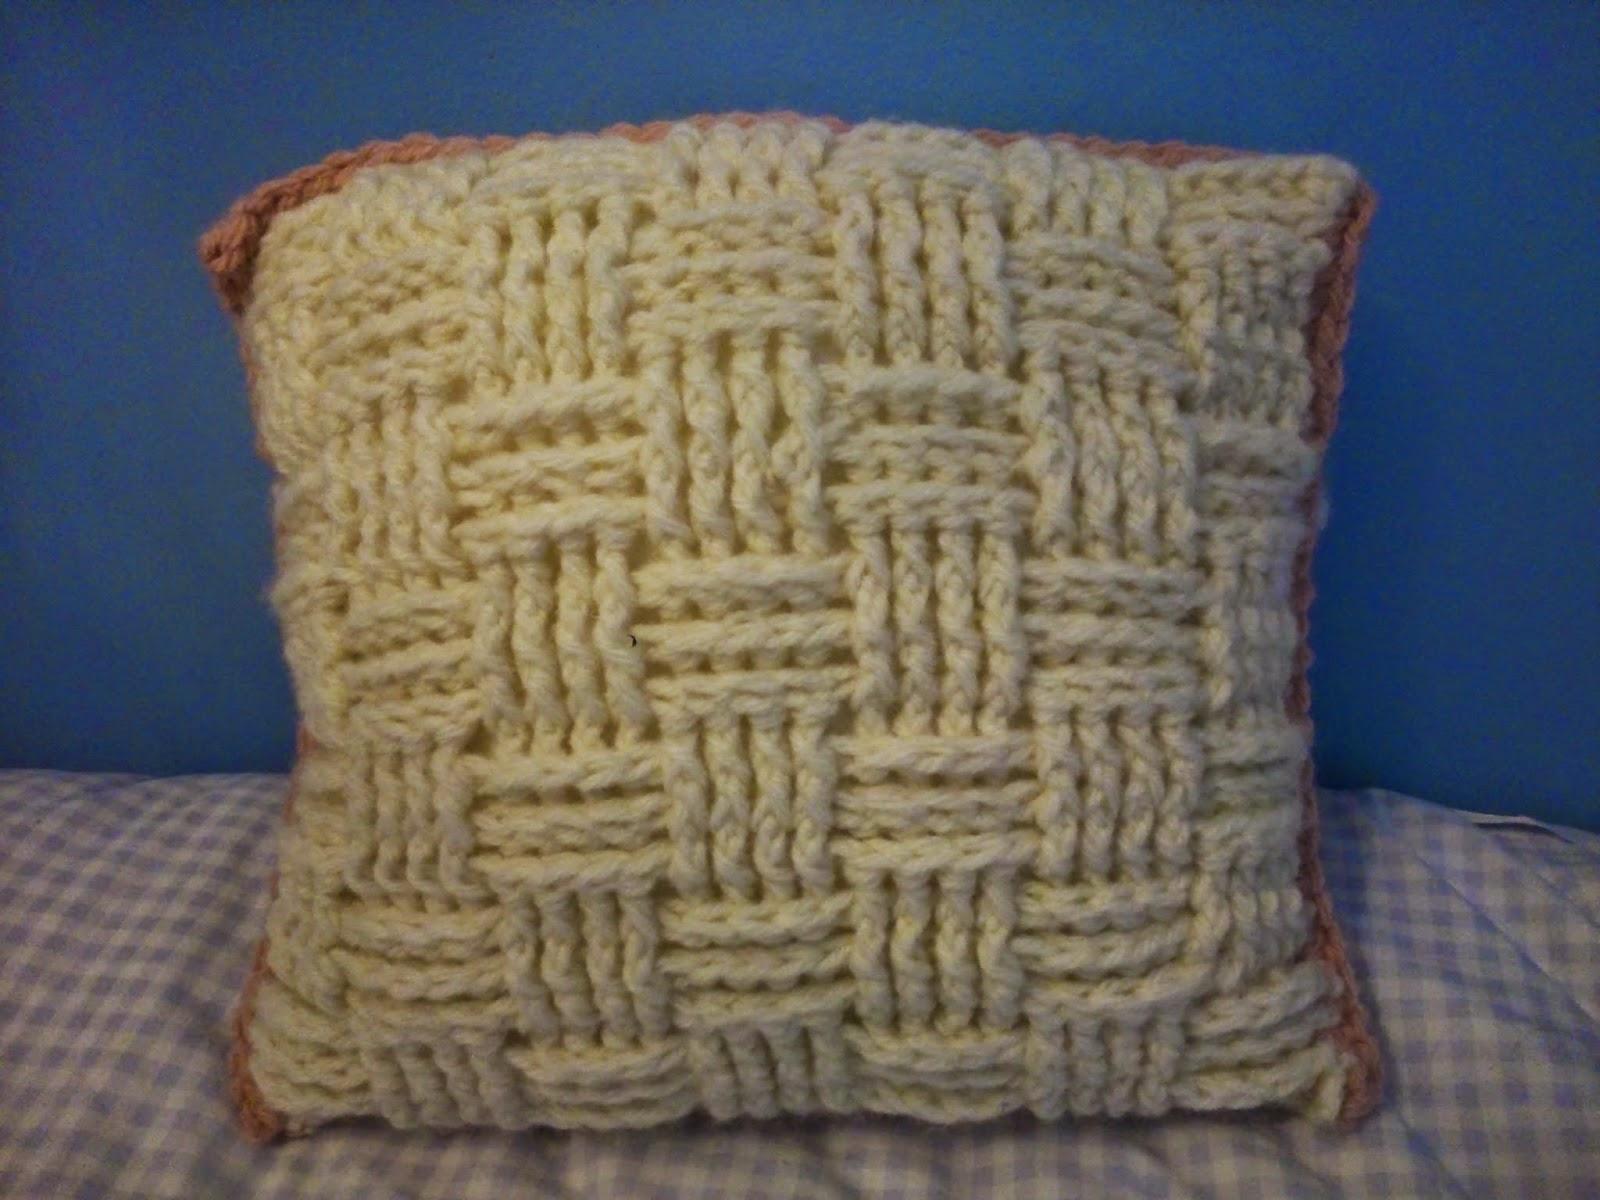 Woven Basket Crochet Stitch : Gone beading basket weave stitch in crochet